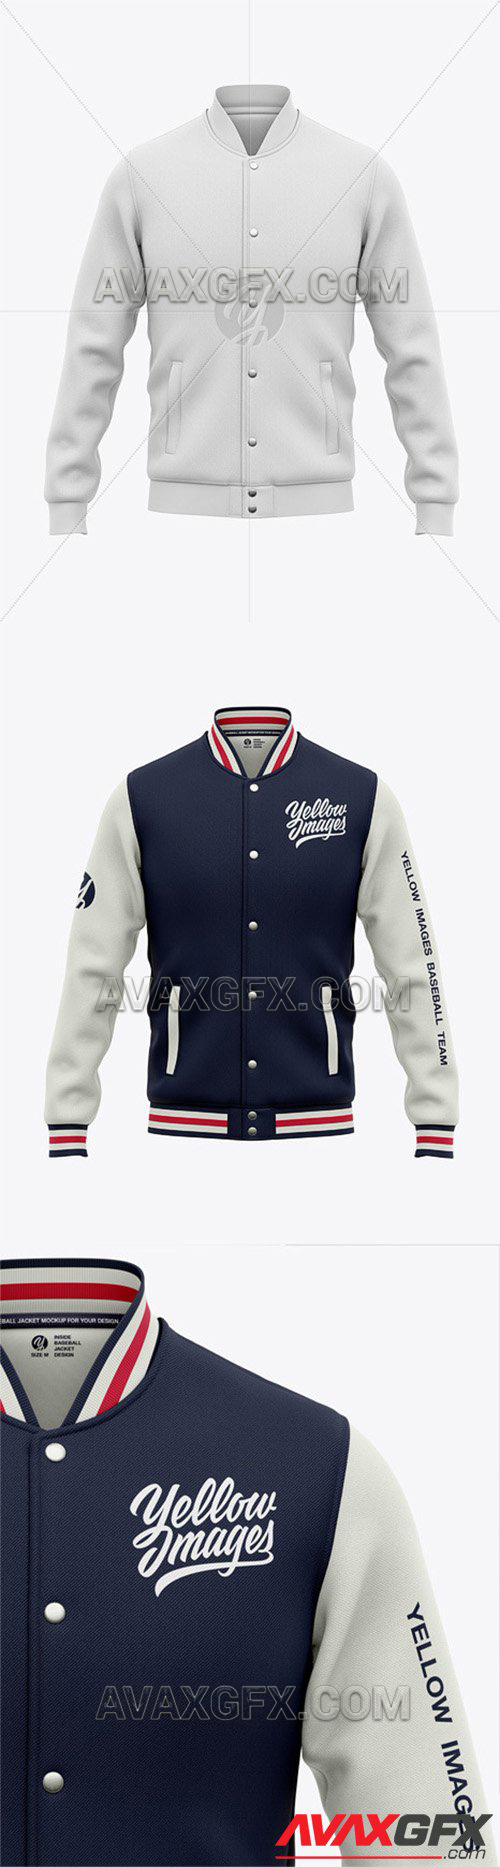 Baseball cap mockup free to present your design. Men S Zipped Bomber Jacket Mockup